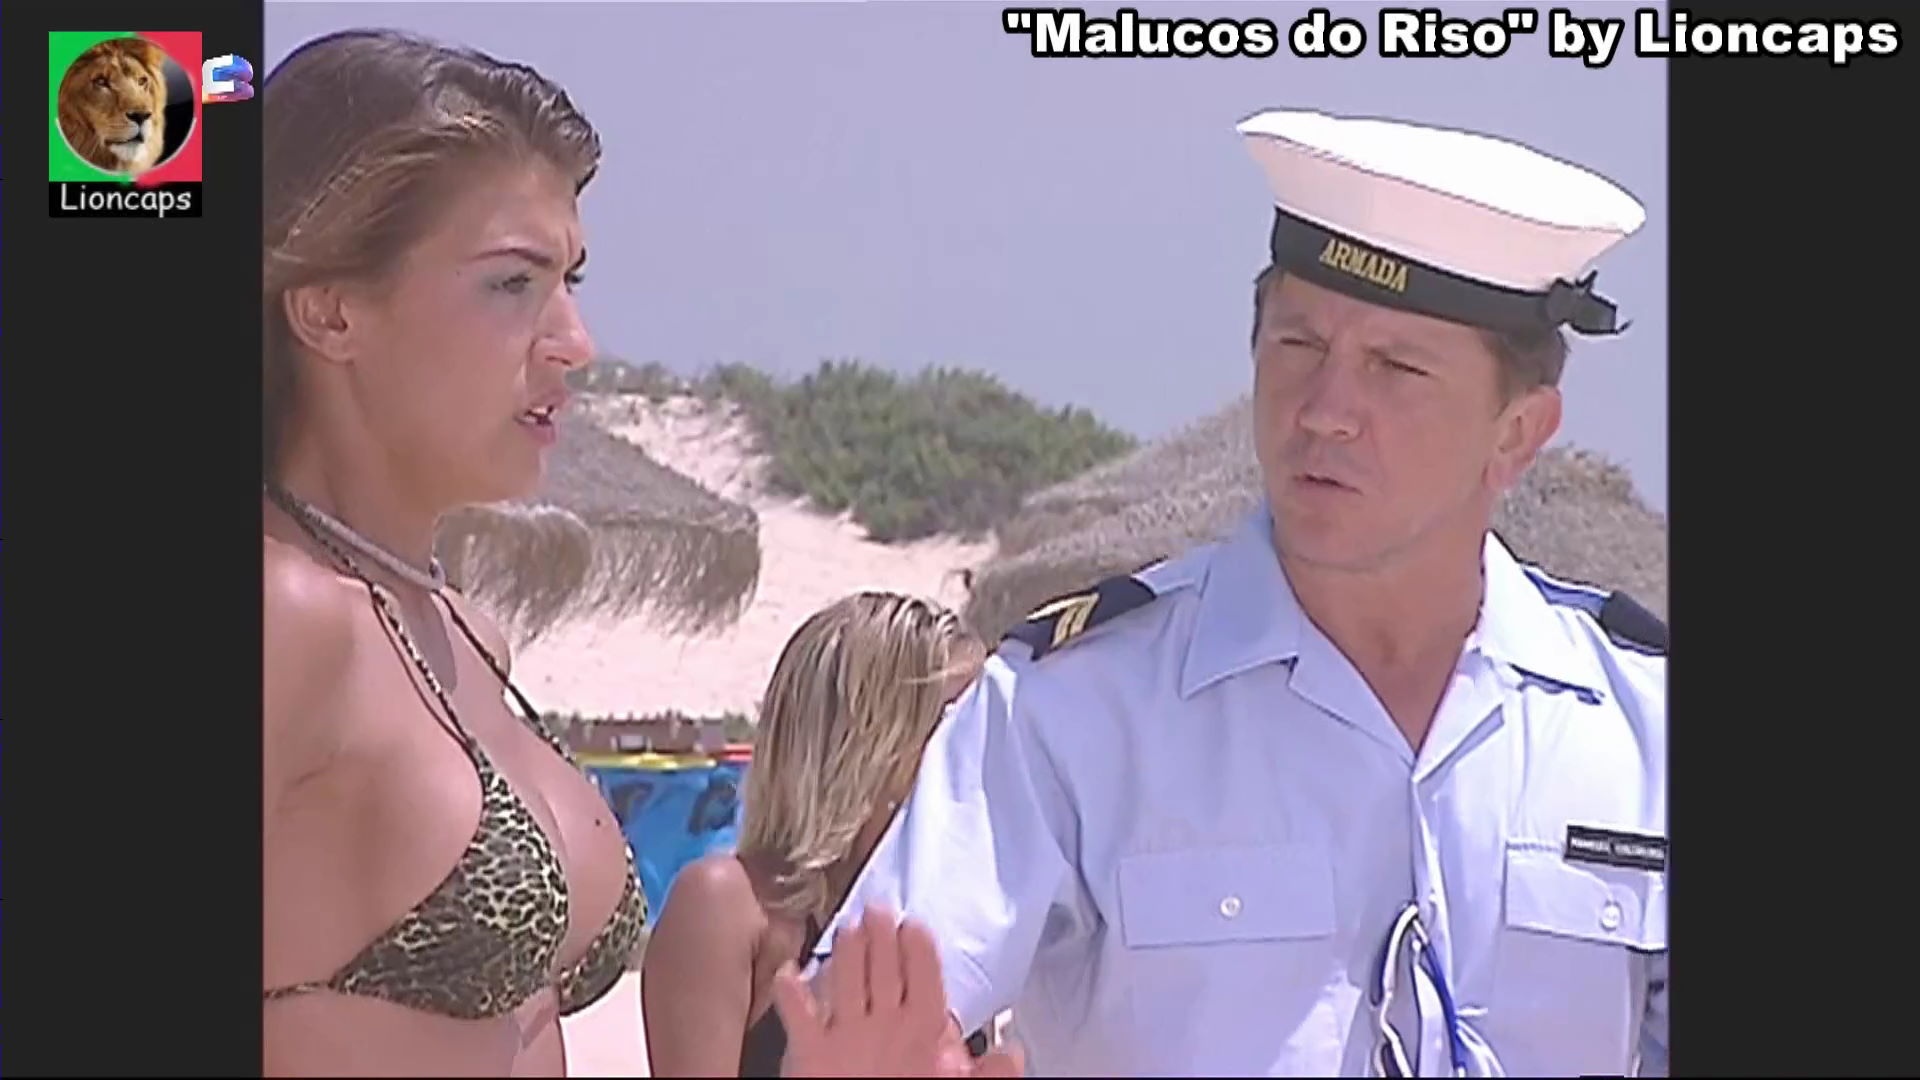 947511850_malucos_riso_alda_gomes_vs190malucos_riso_602_15043_122_160lo.JPG